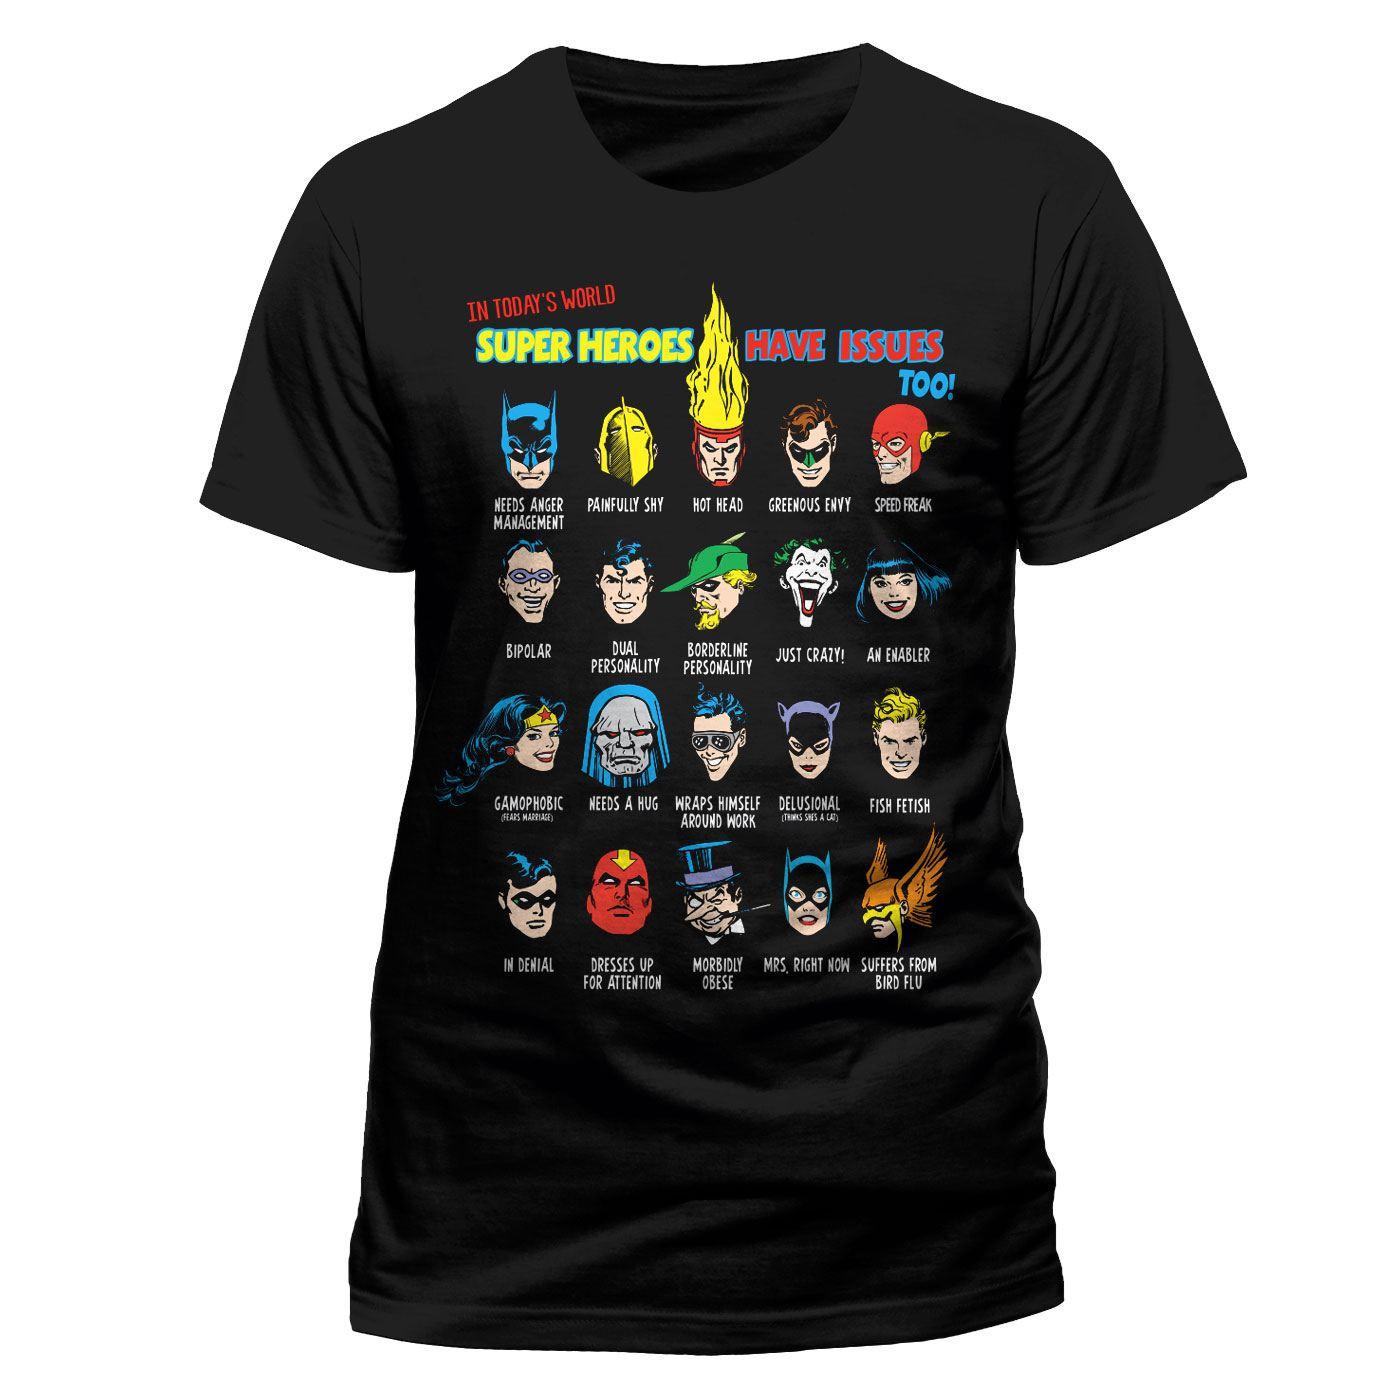 Justice League T-Shirt Superhero Issues Size M